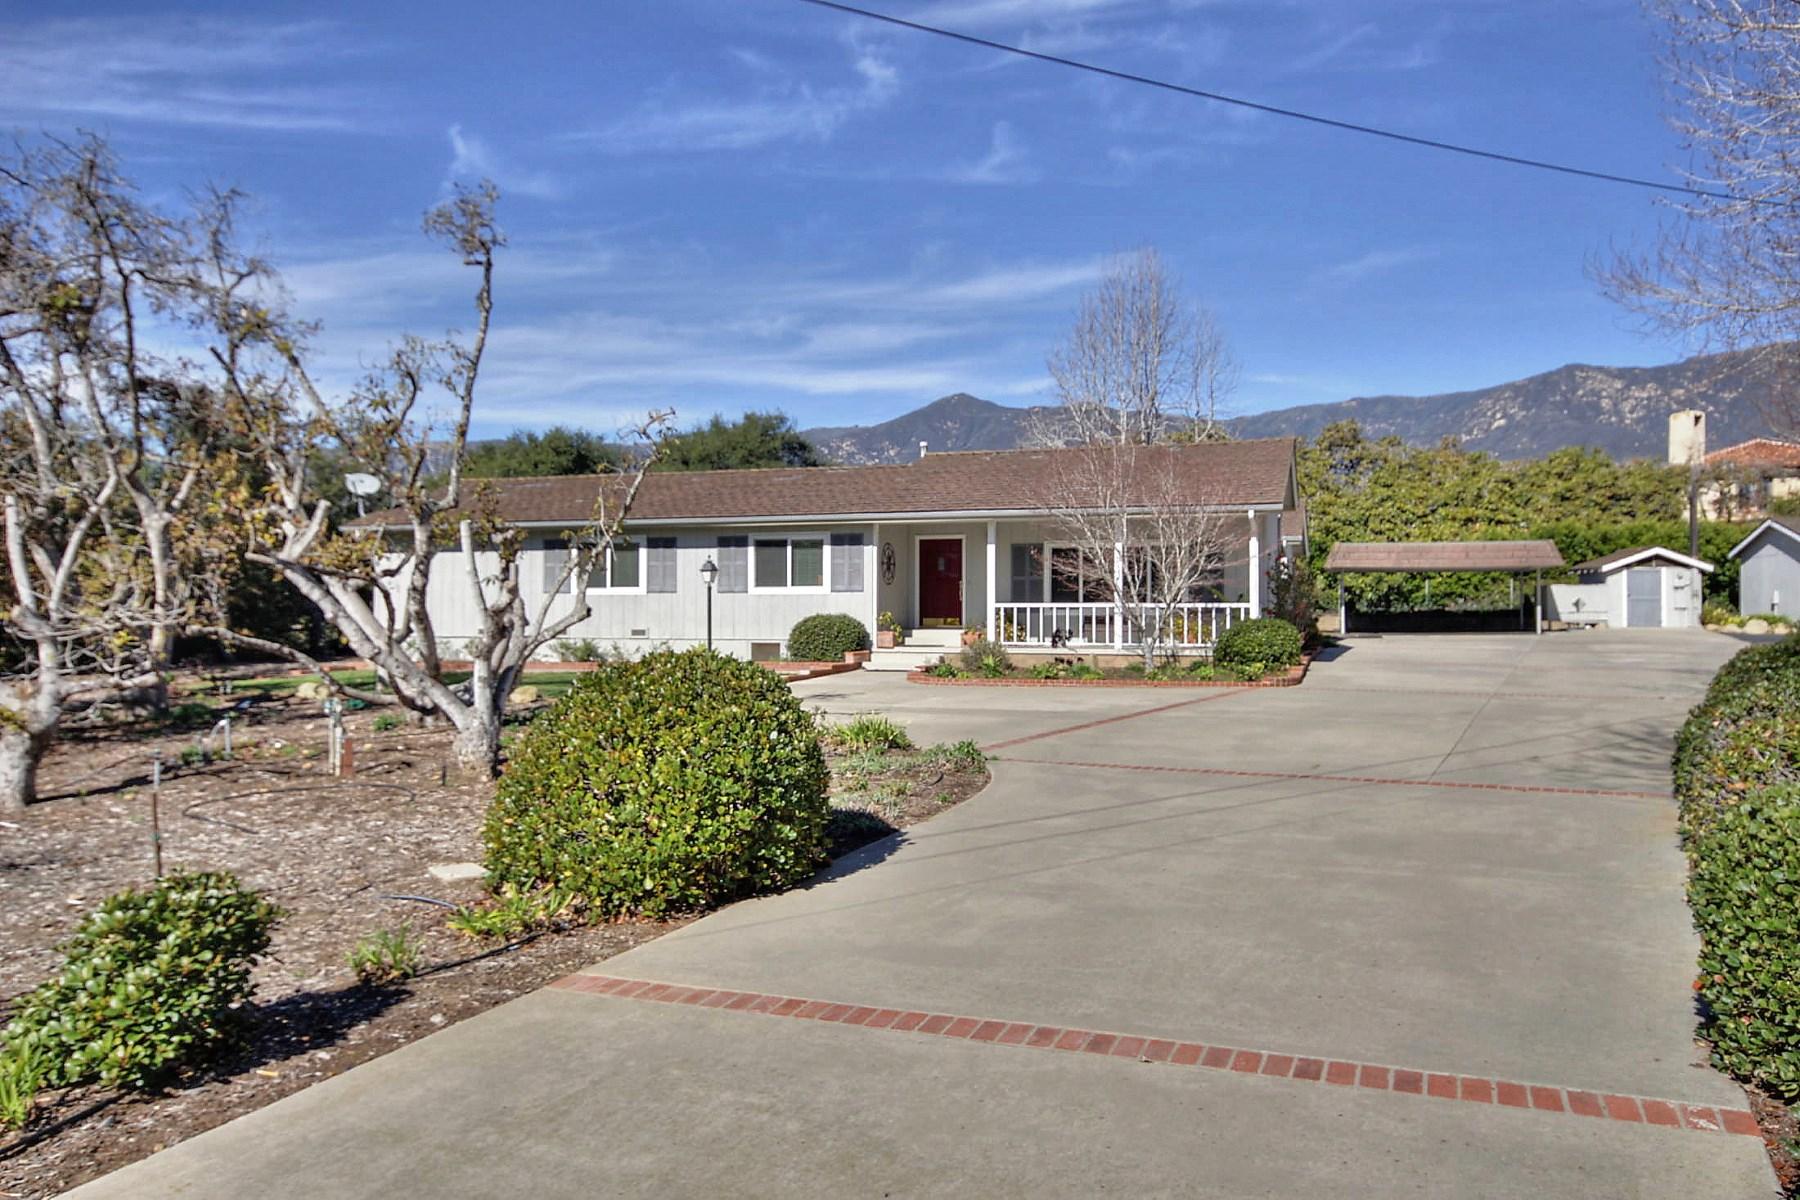 Single Family Home for Sale at Montecito Home, Prime Location. 120 Tiburon Bay Lane Montecito, California 93108 United States